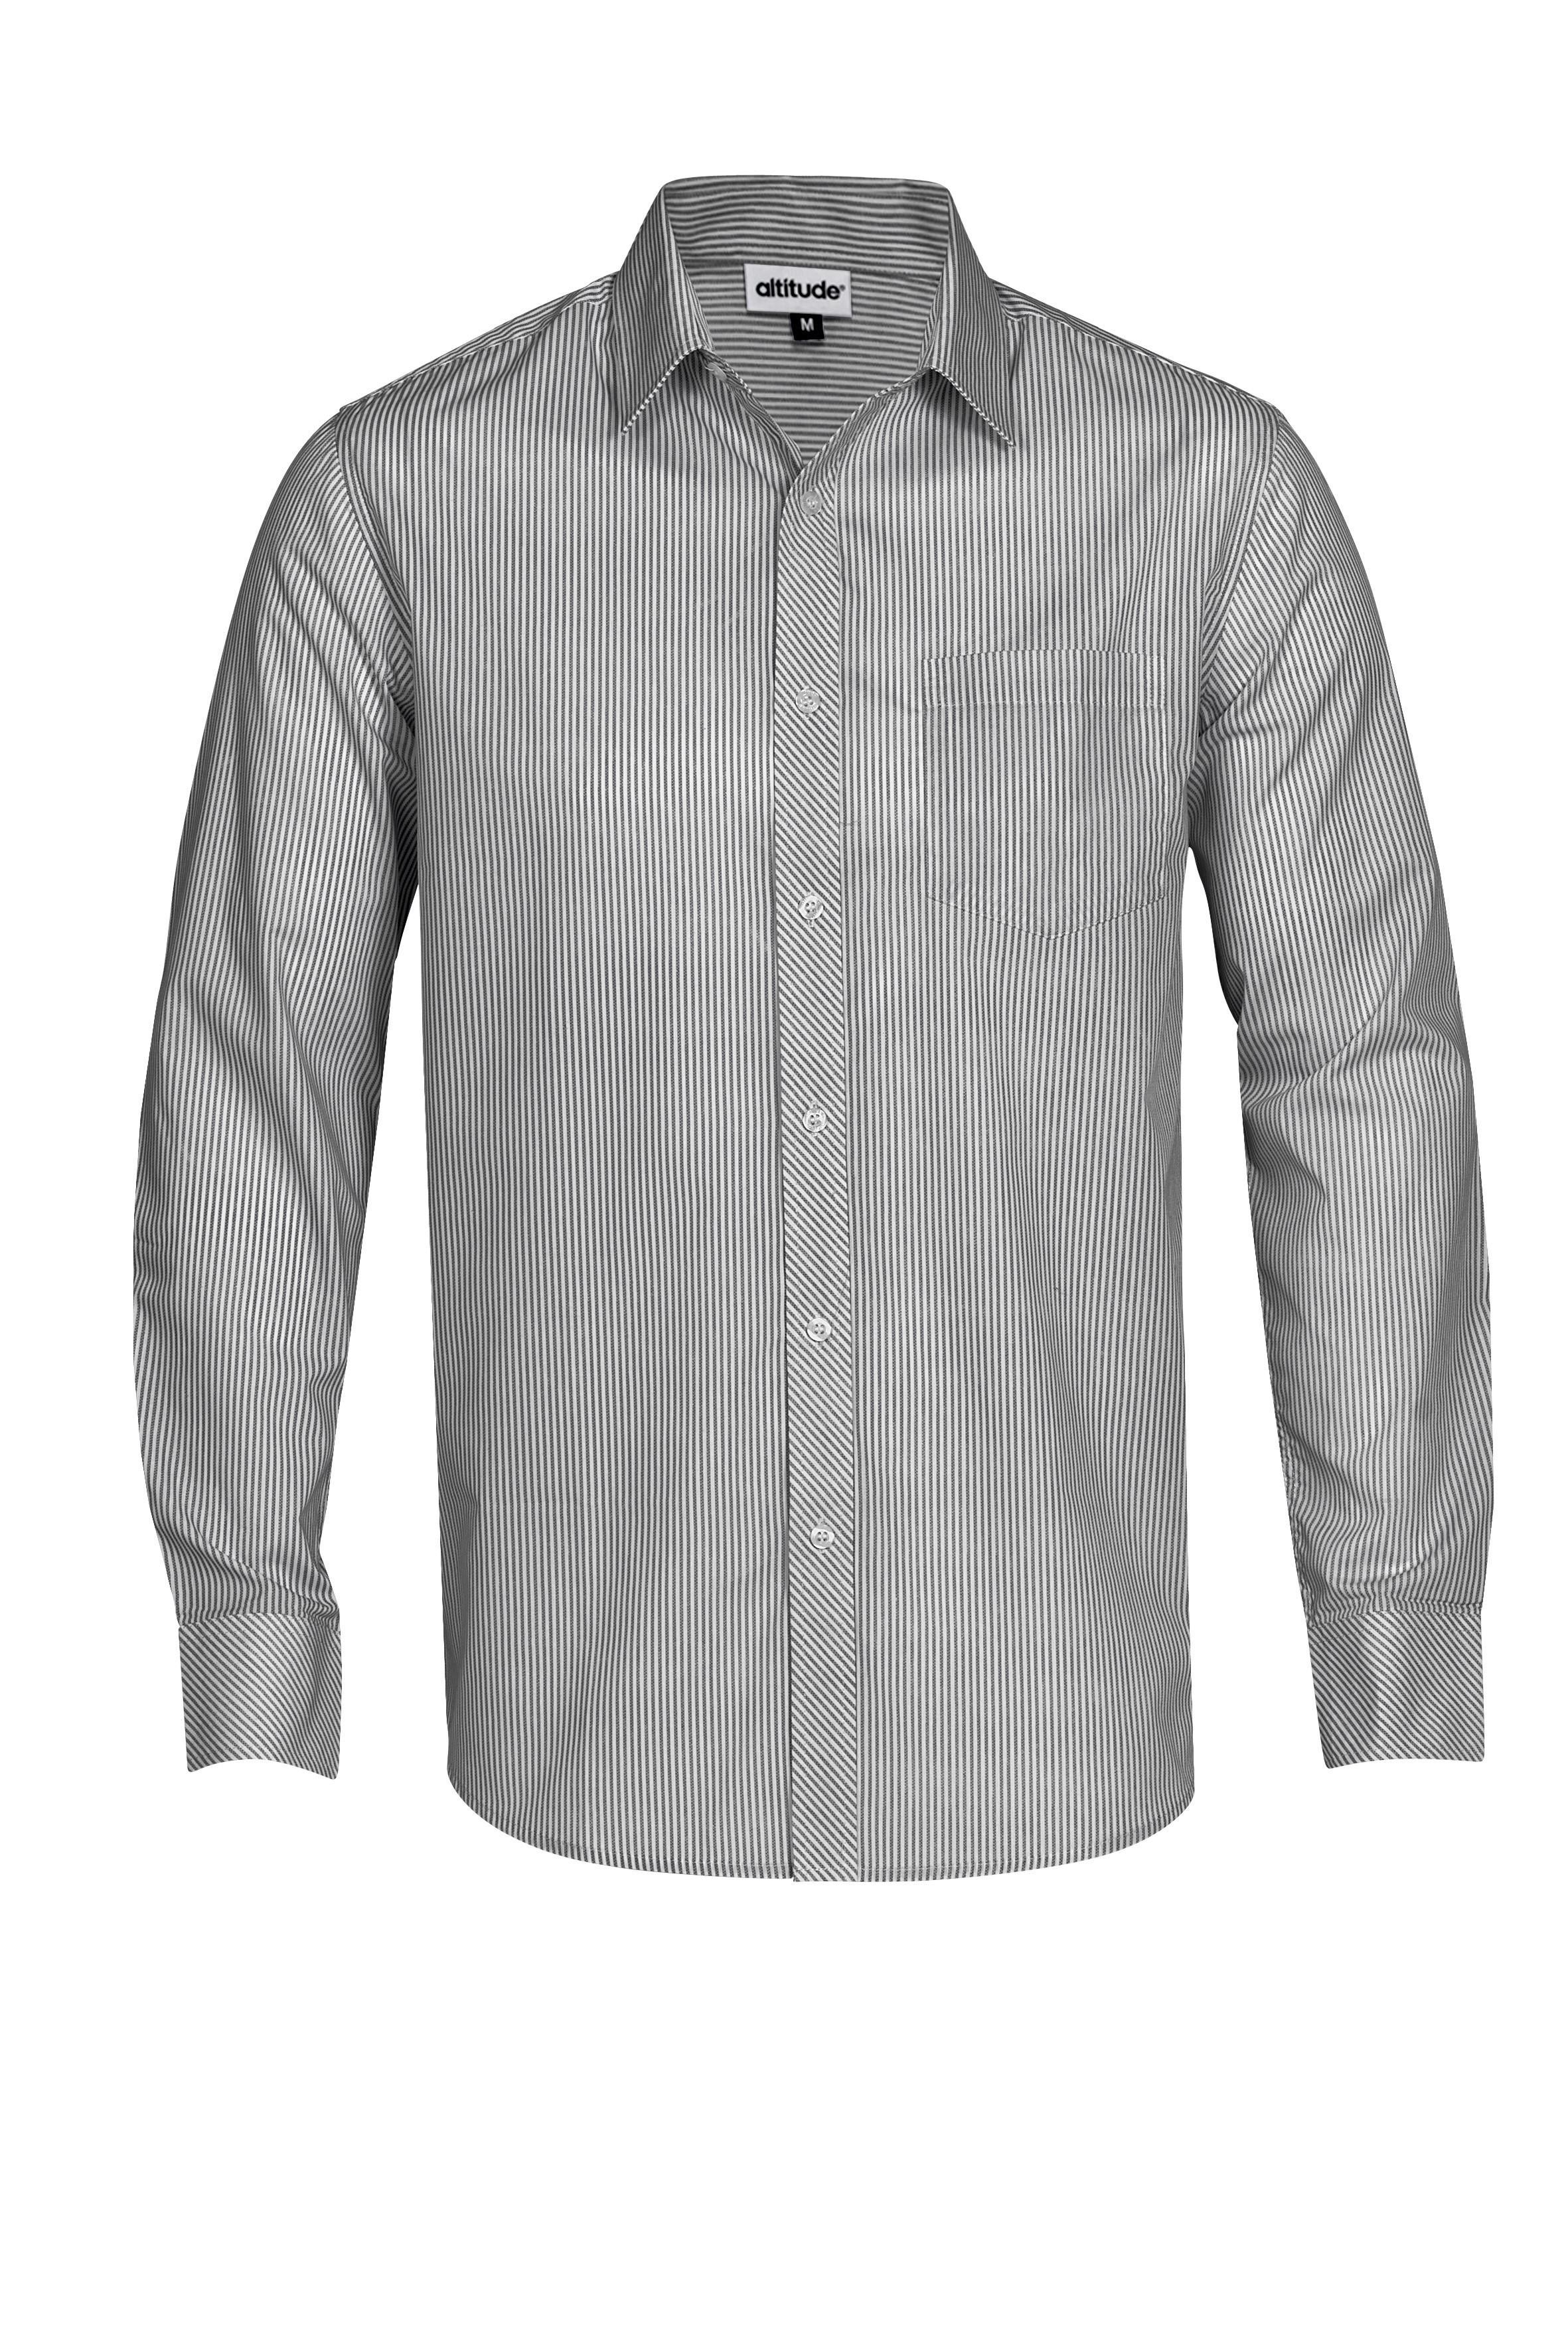 Mens Long Sleeve Birmingham Shirt